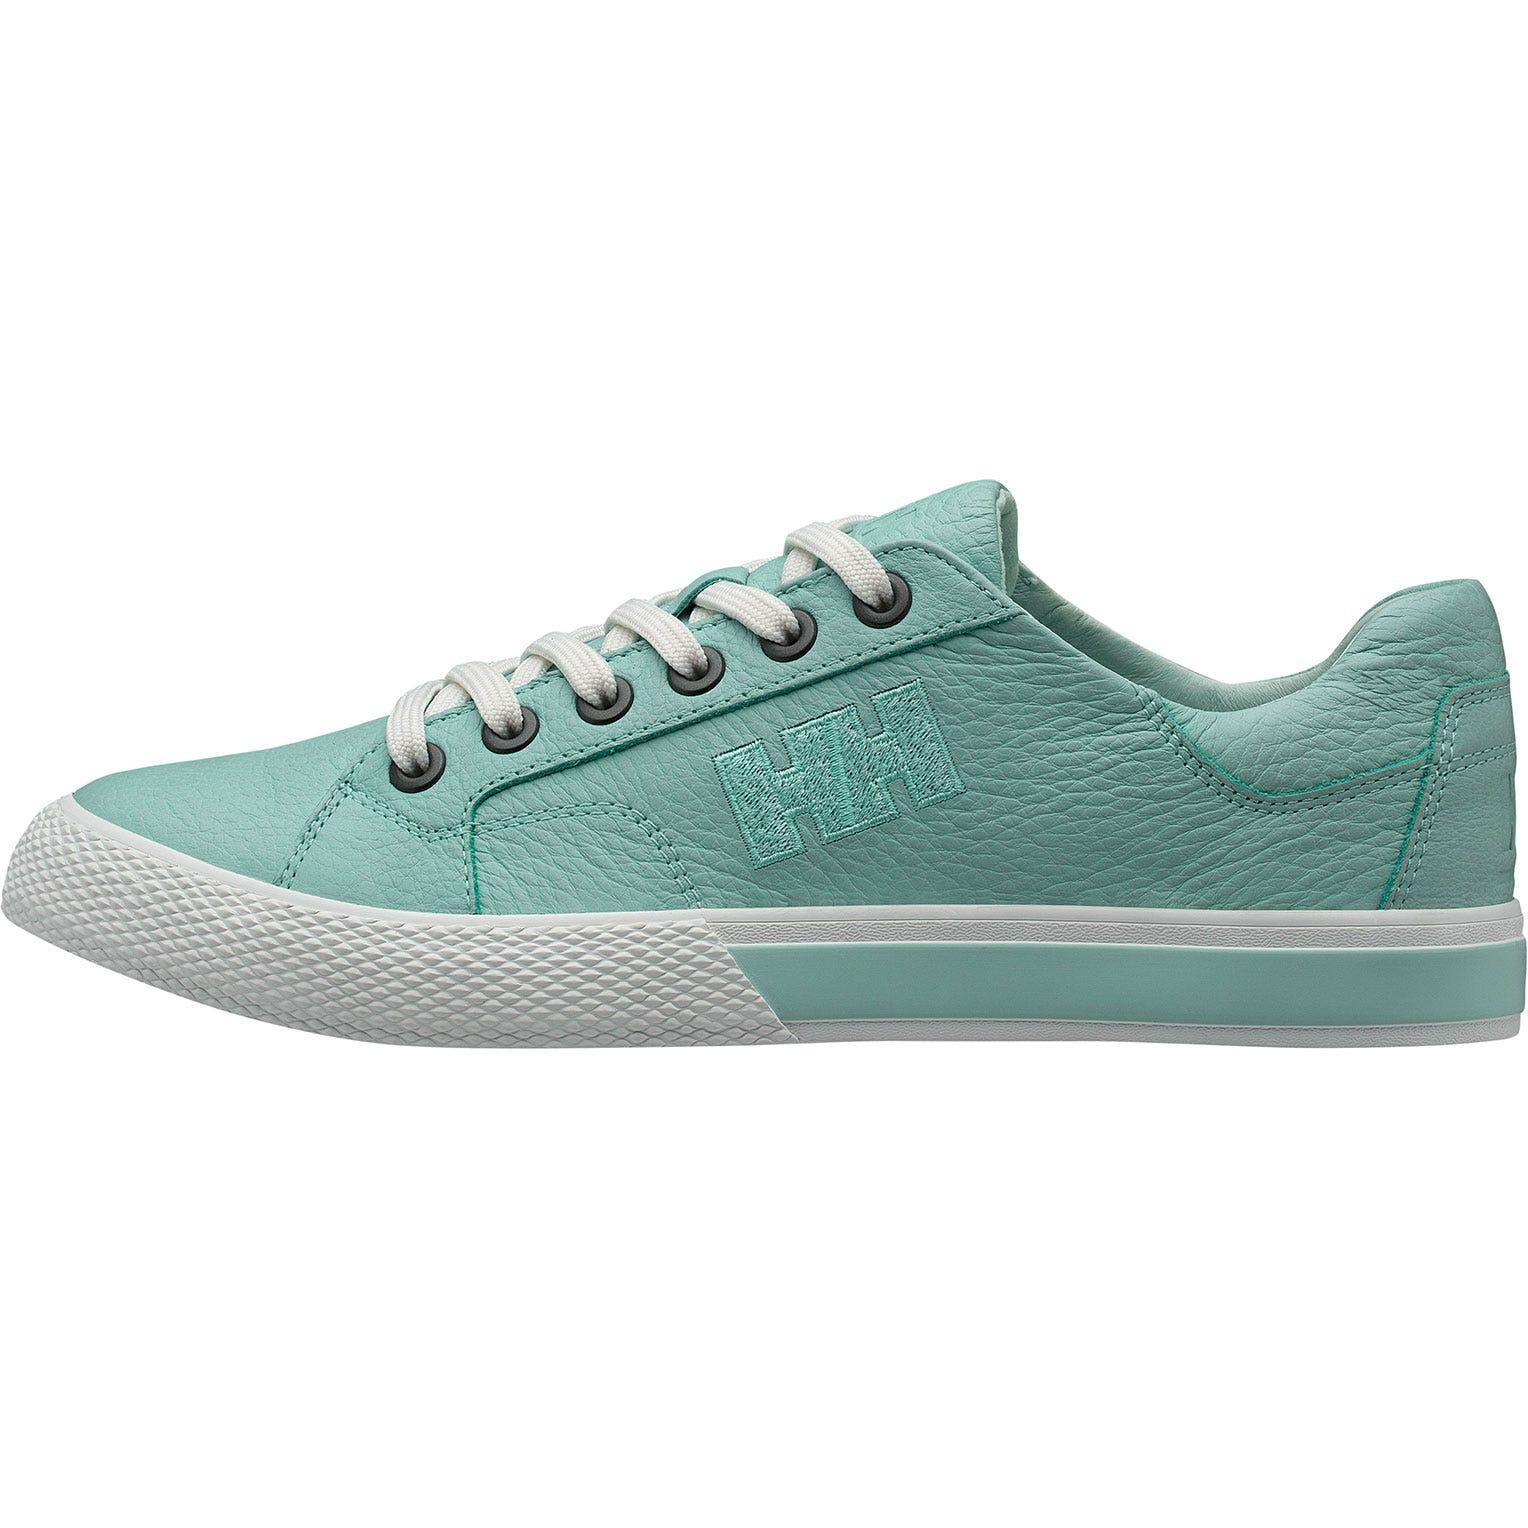 Helly Hansen W Fjord Lv2 Womens Casual Shoe Blue 42/10